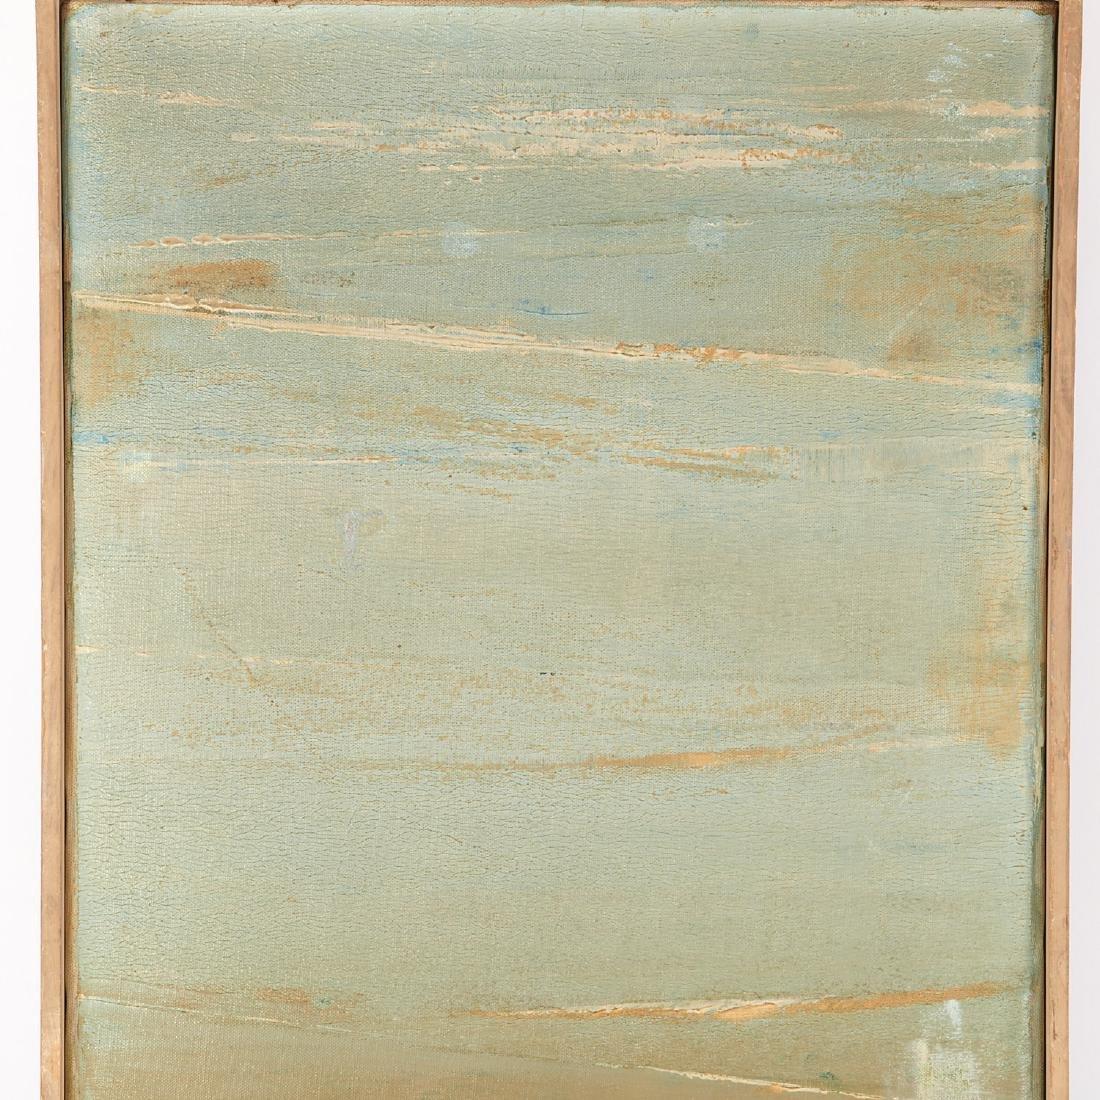 Dorr Bothwell, California painting - 2